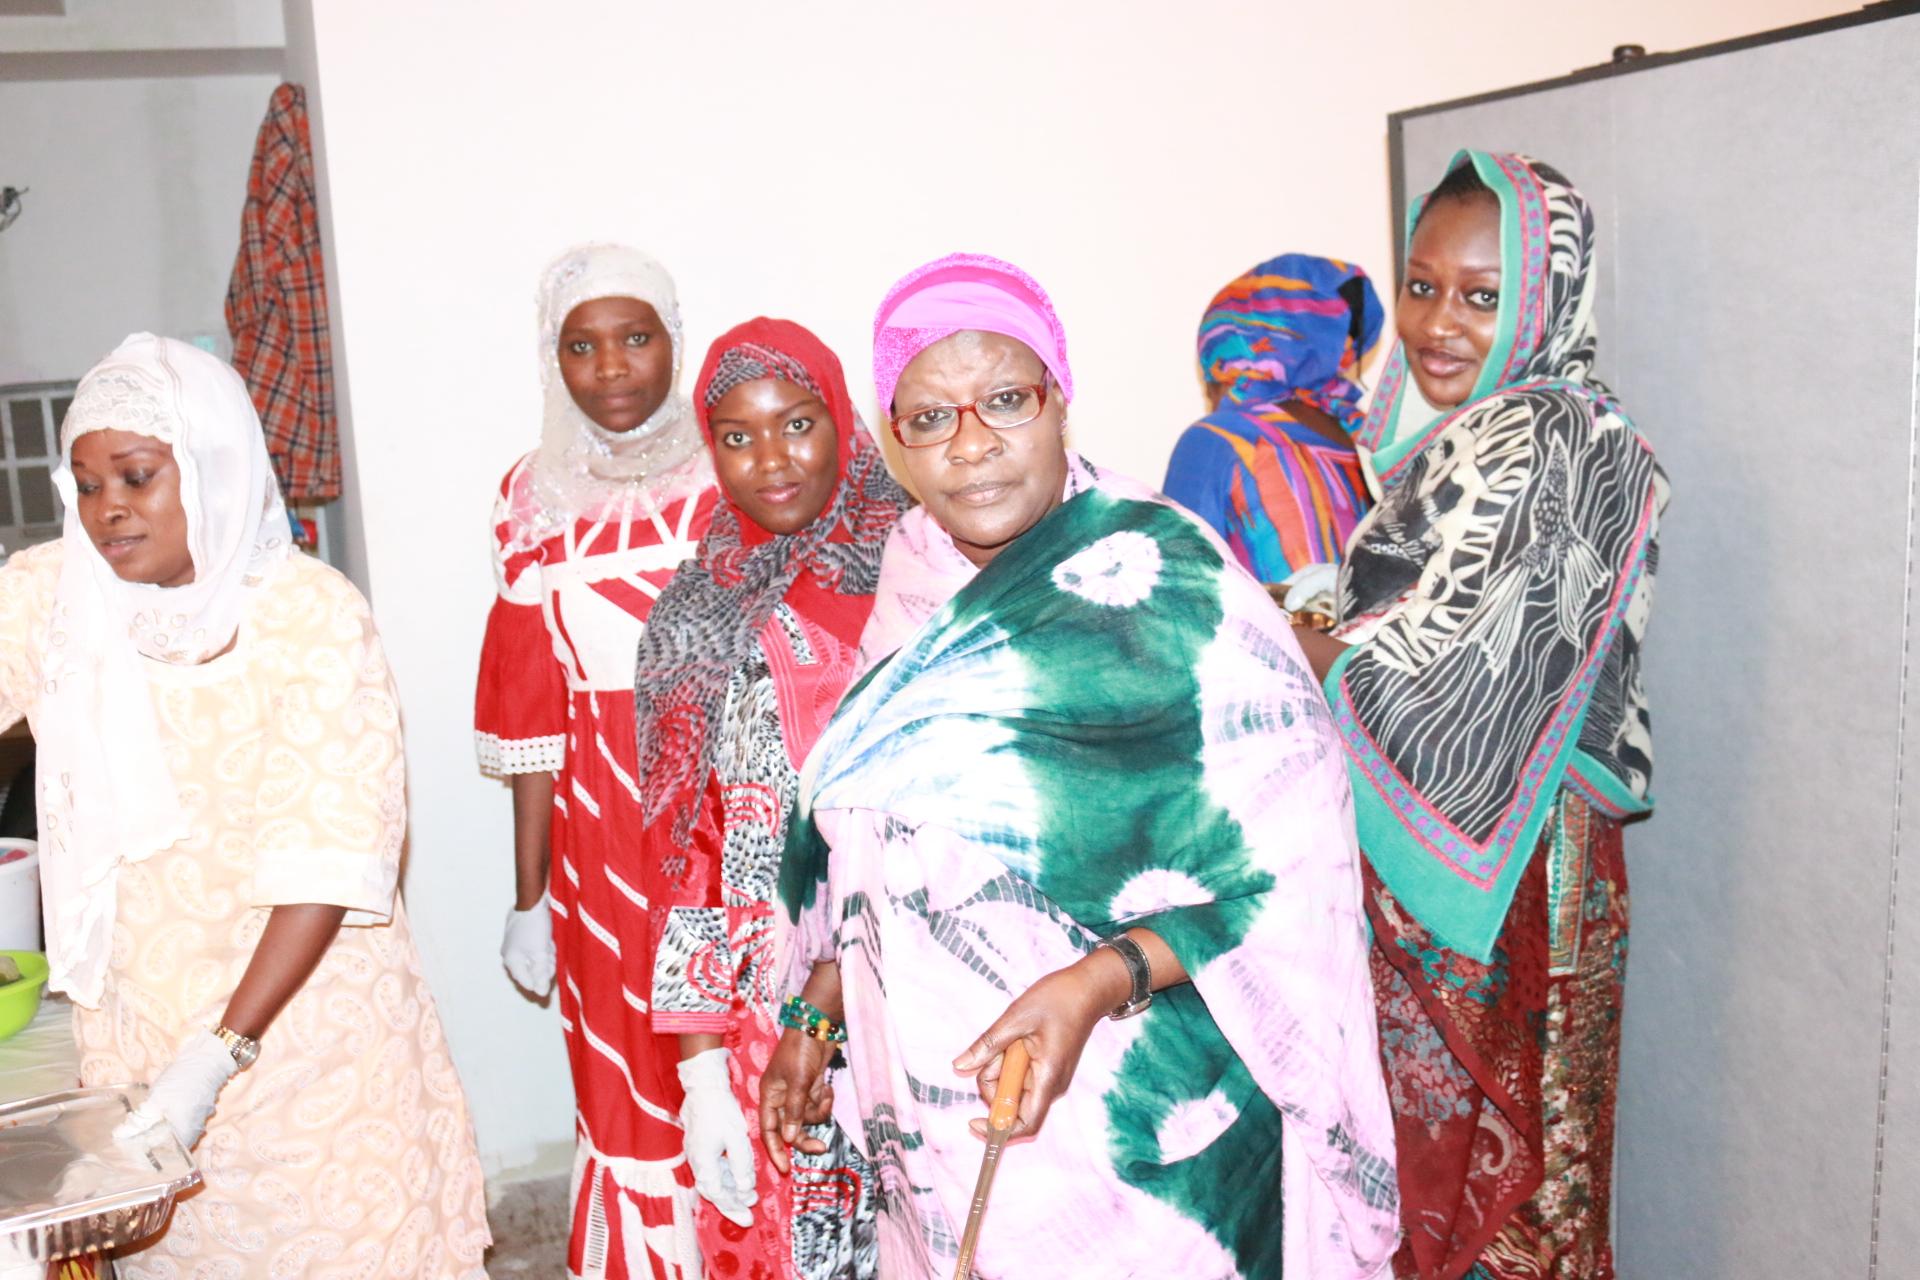 wa wagnebii: Houleye Diagne, sokhna Awa Ba Yayou daara, Amy Diouf, Amy séne